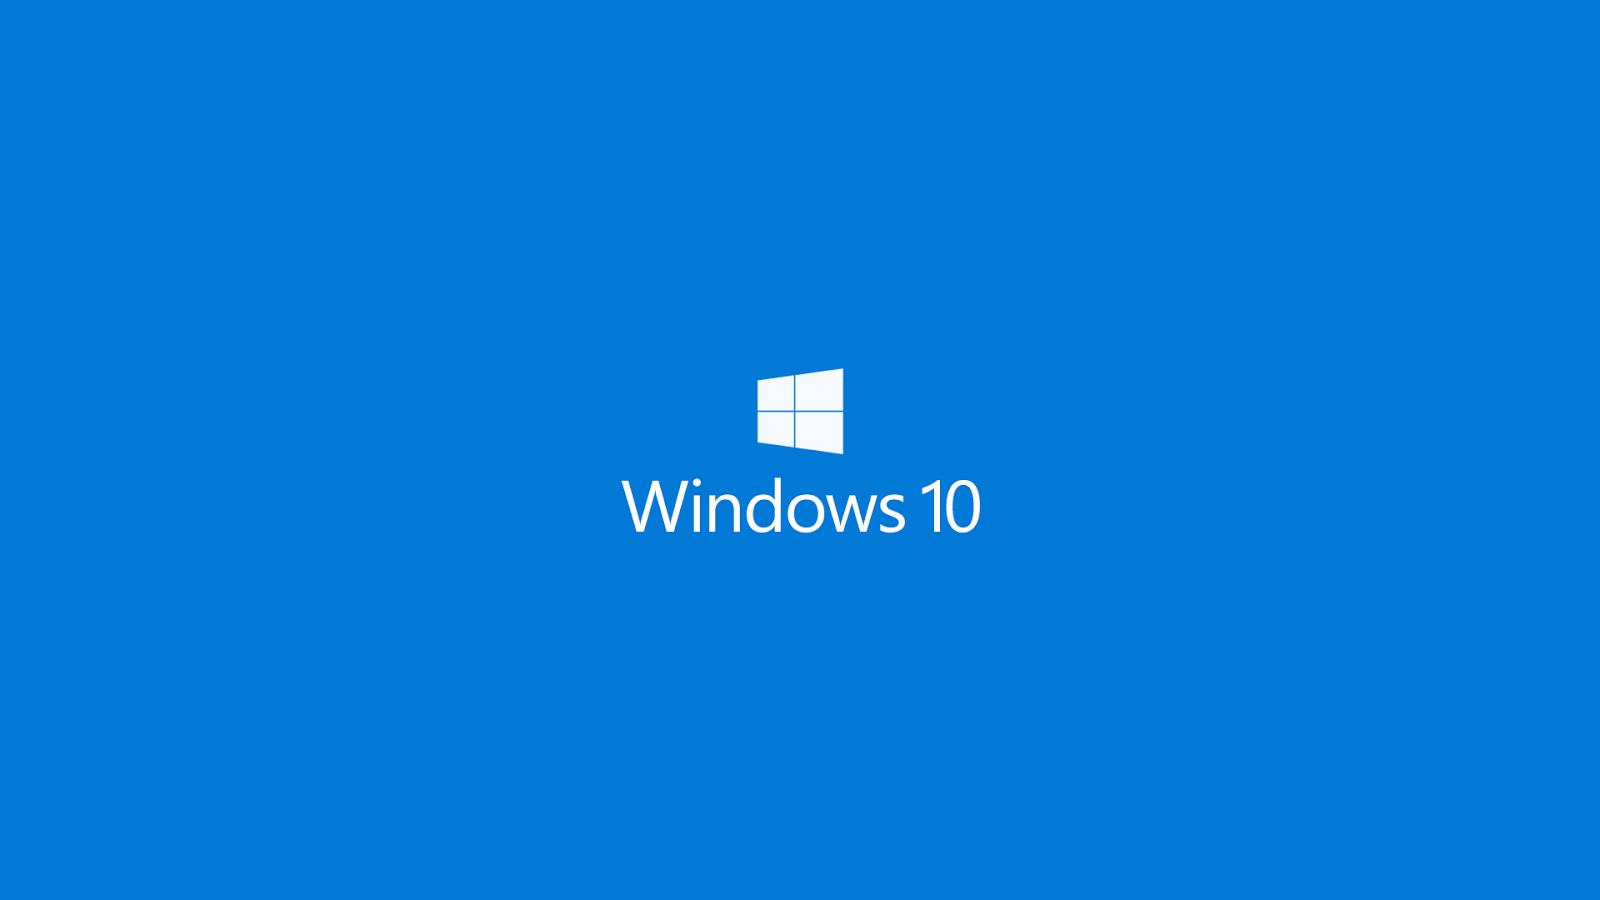 Windows 10 Pro Final Original Microsoft Vlsc: DOWNLOAD Windows 10 Pro 32/64 Bits + Ativador